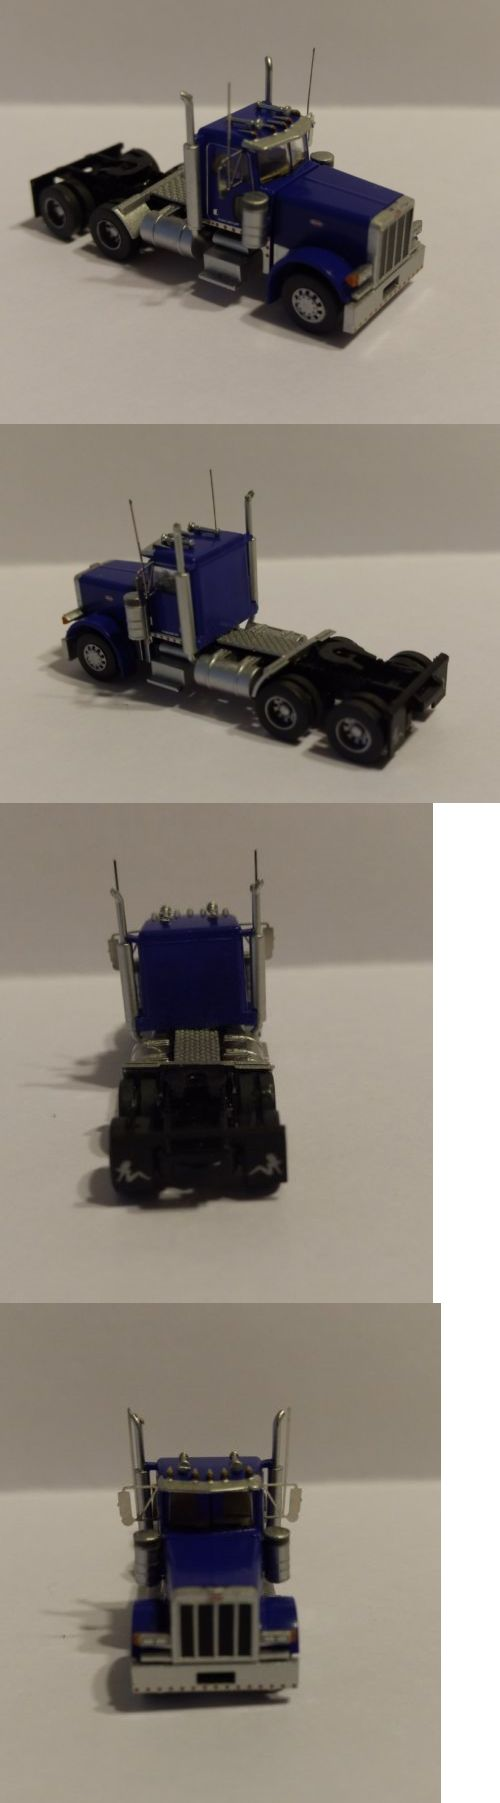 Other n scale parts and accs 13294 trainworx custom built 379 peterbuilt semi truck n